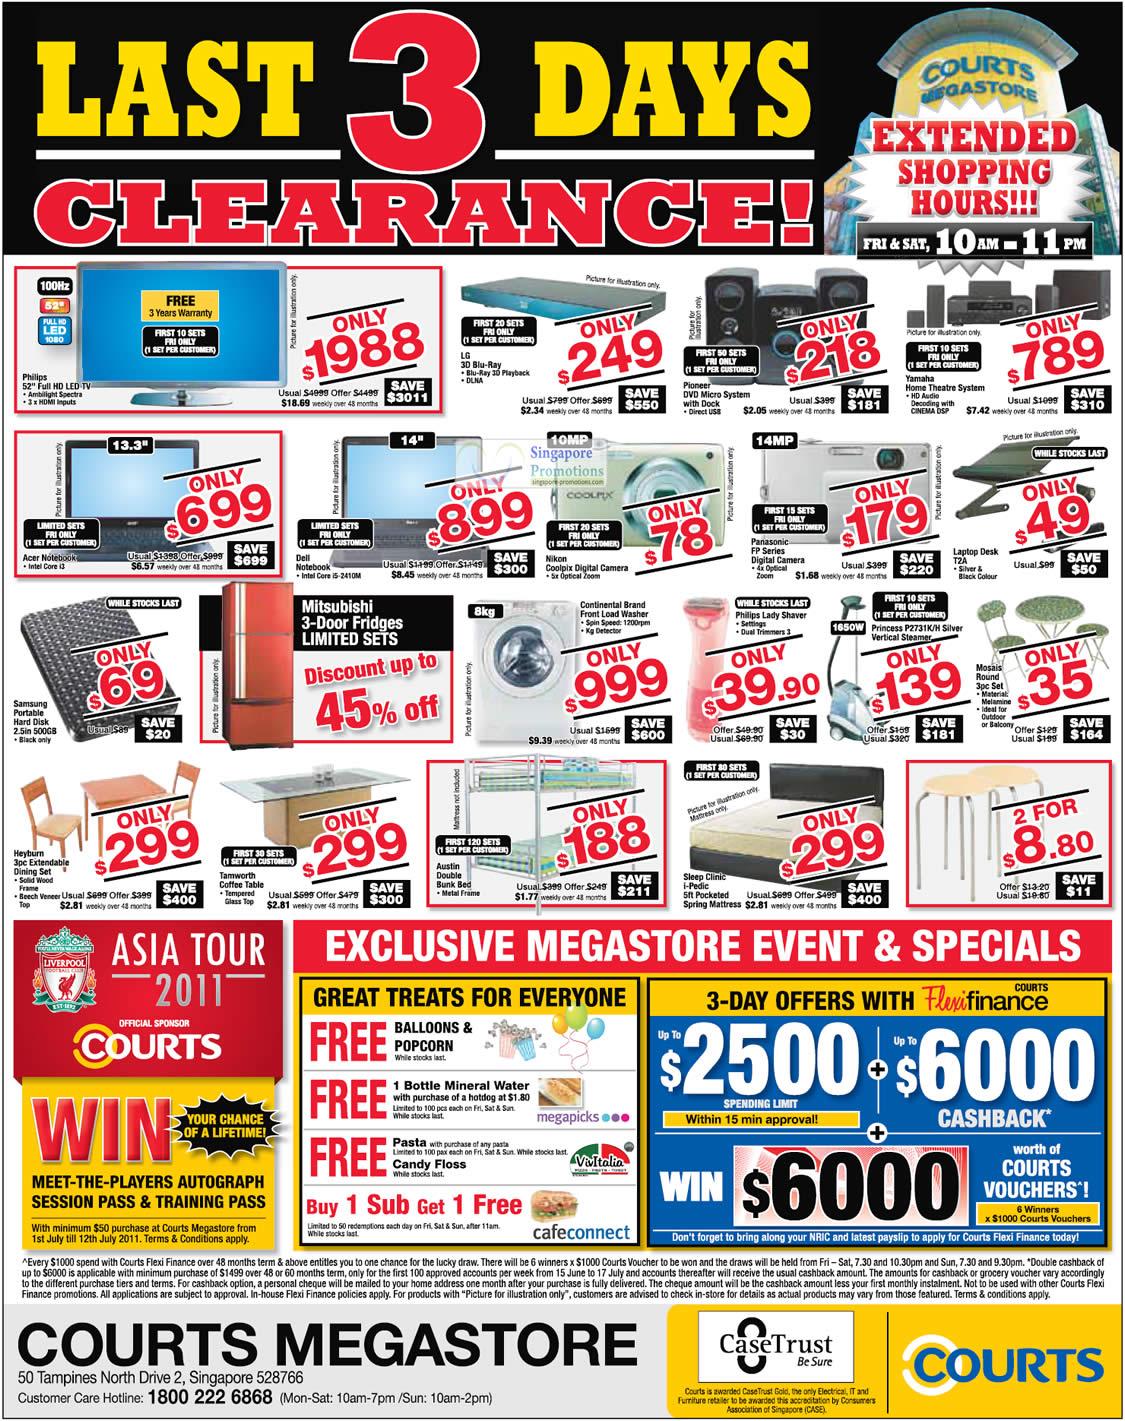 1 Jul Philips TV, LG Blu Ray, Nikon, Dell Notebook, Acer, Panasonic, Samsung 500GB External, Heyburn Dining Set, Tamworth Coffee Tablet, Austin Double Bunk Bed